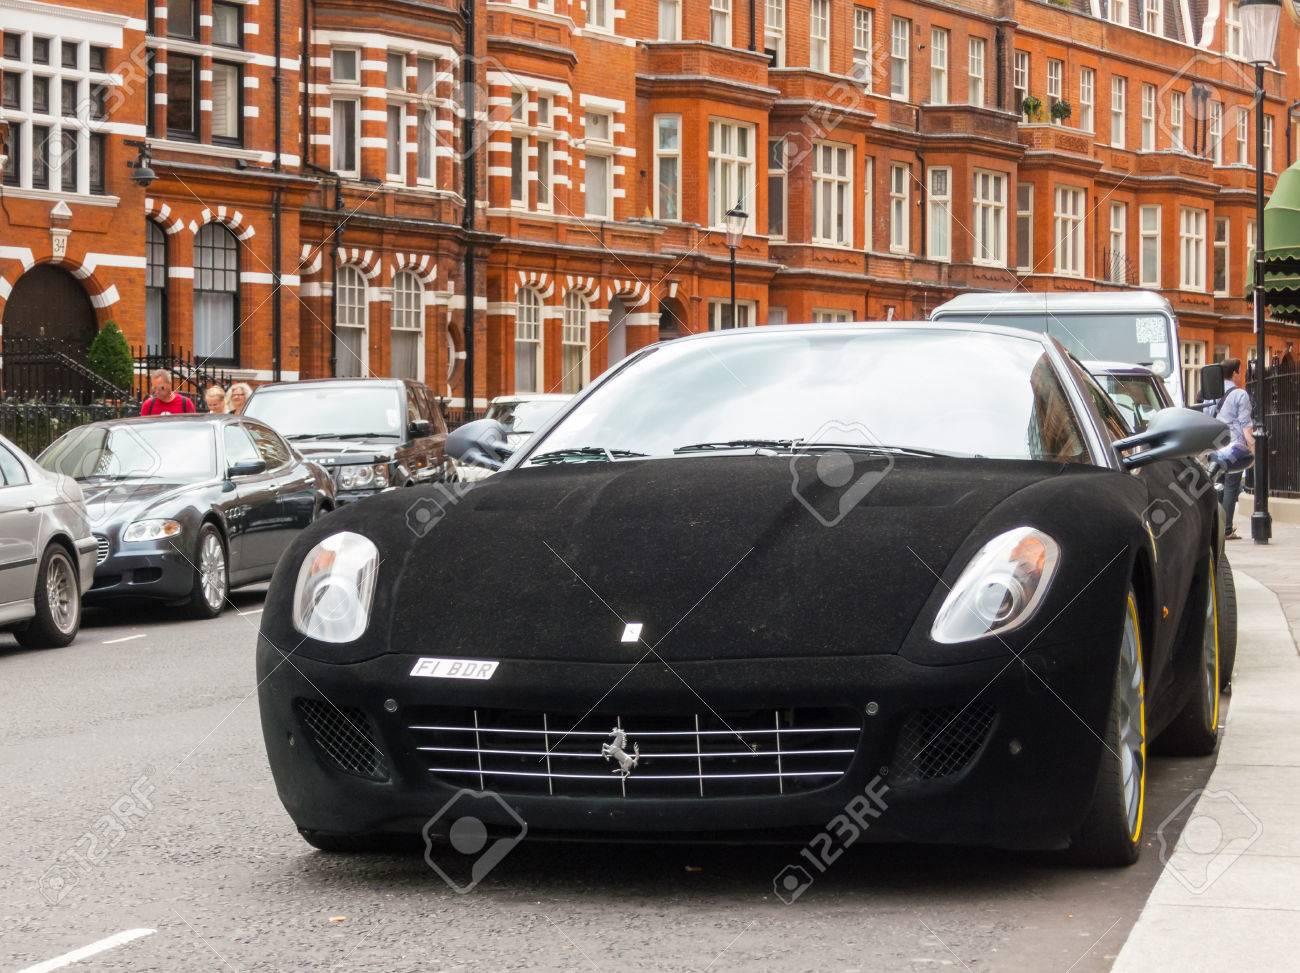 London Uk Circa August 2013 A Ferrari 599 Gtb Fiorano With A Black Velvet Wrap Banco De Imagens Royalty Free Ilustracoes Imagens E Banco De Imagens Image 35206740